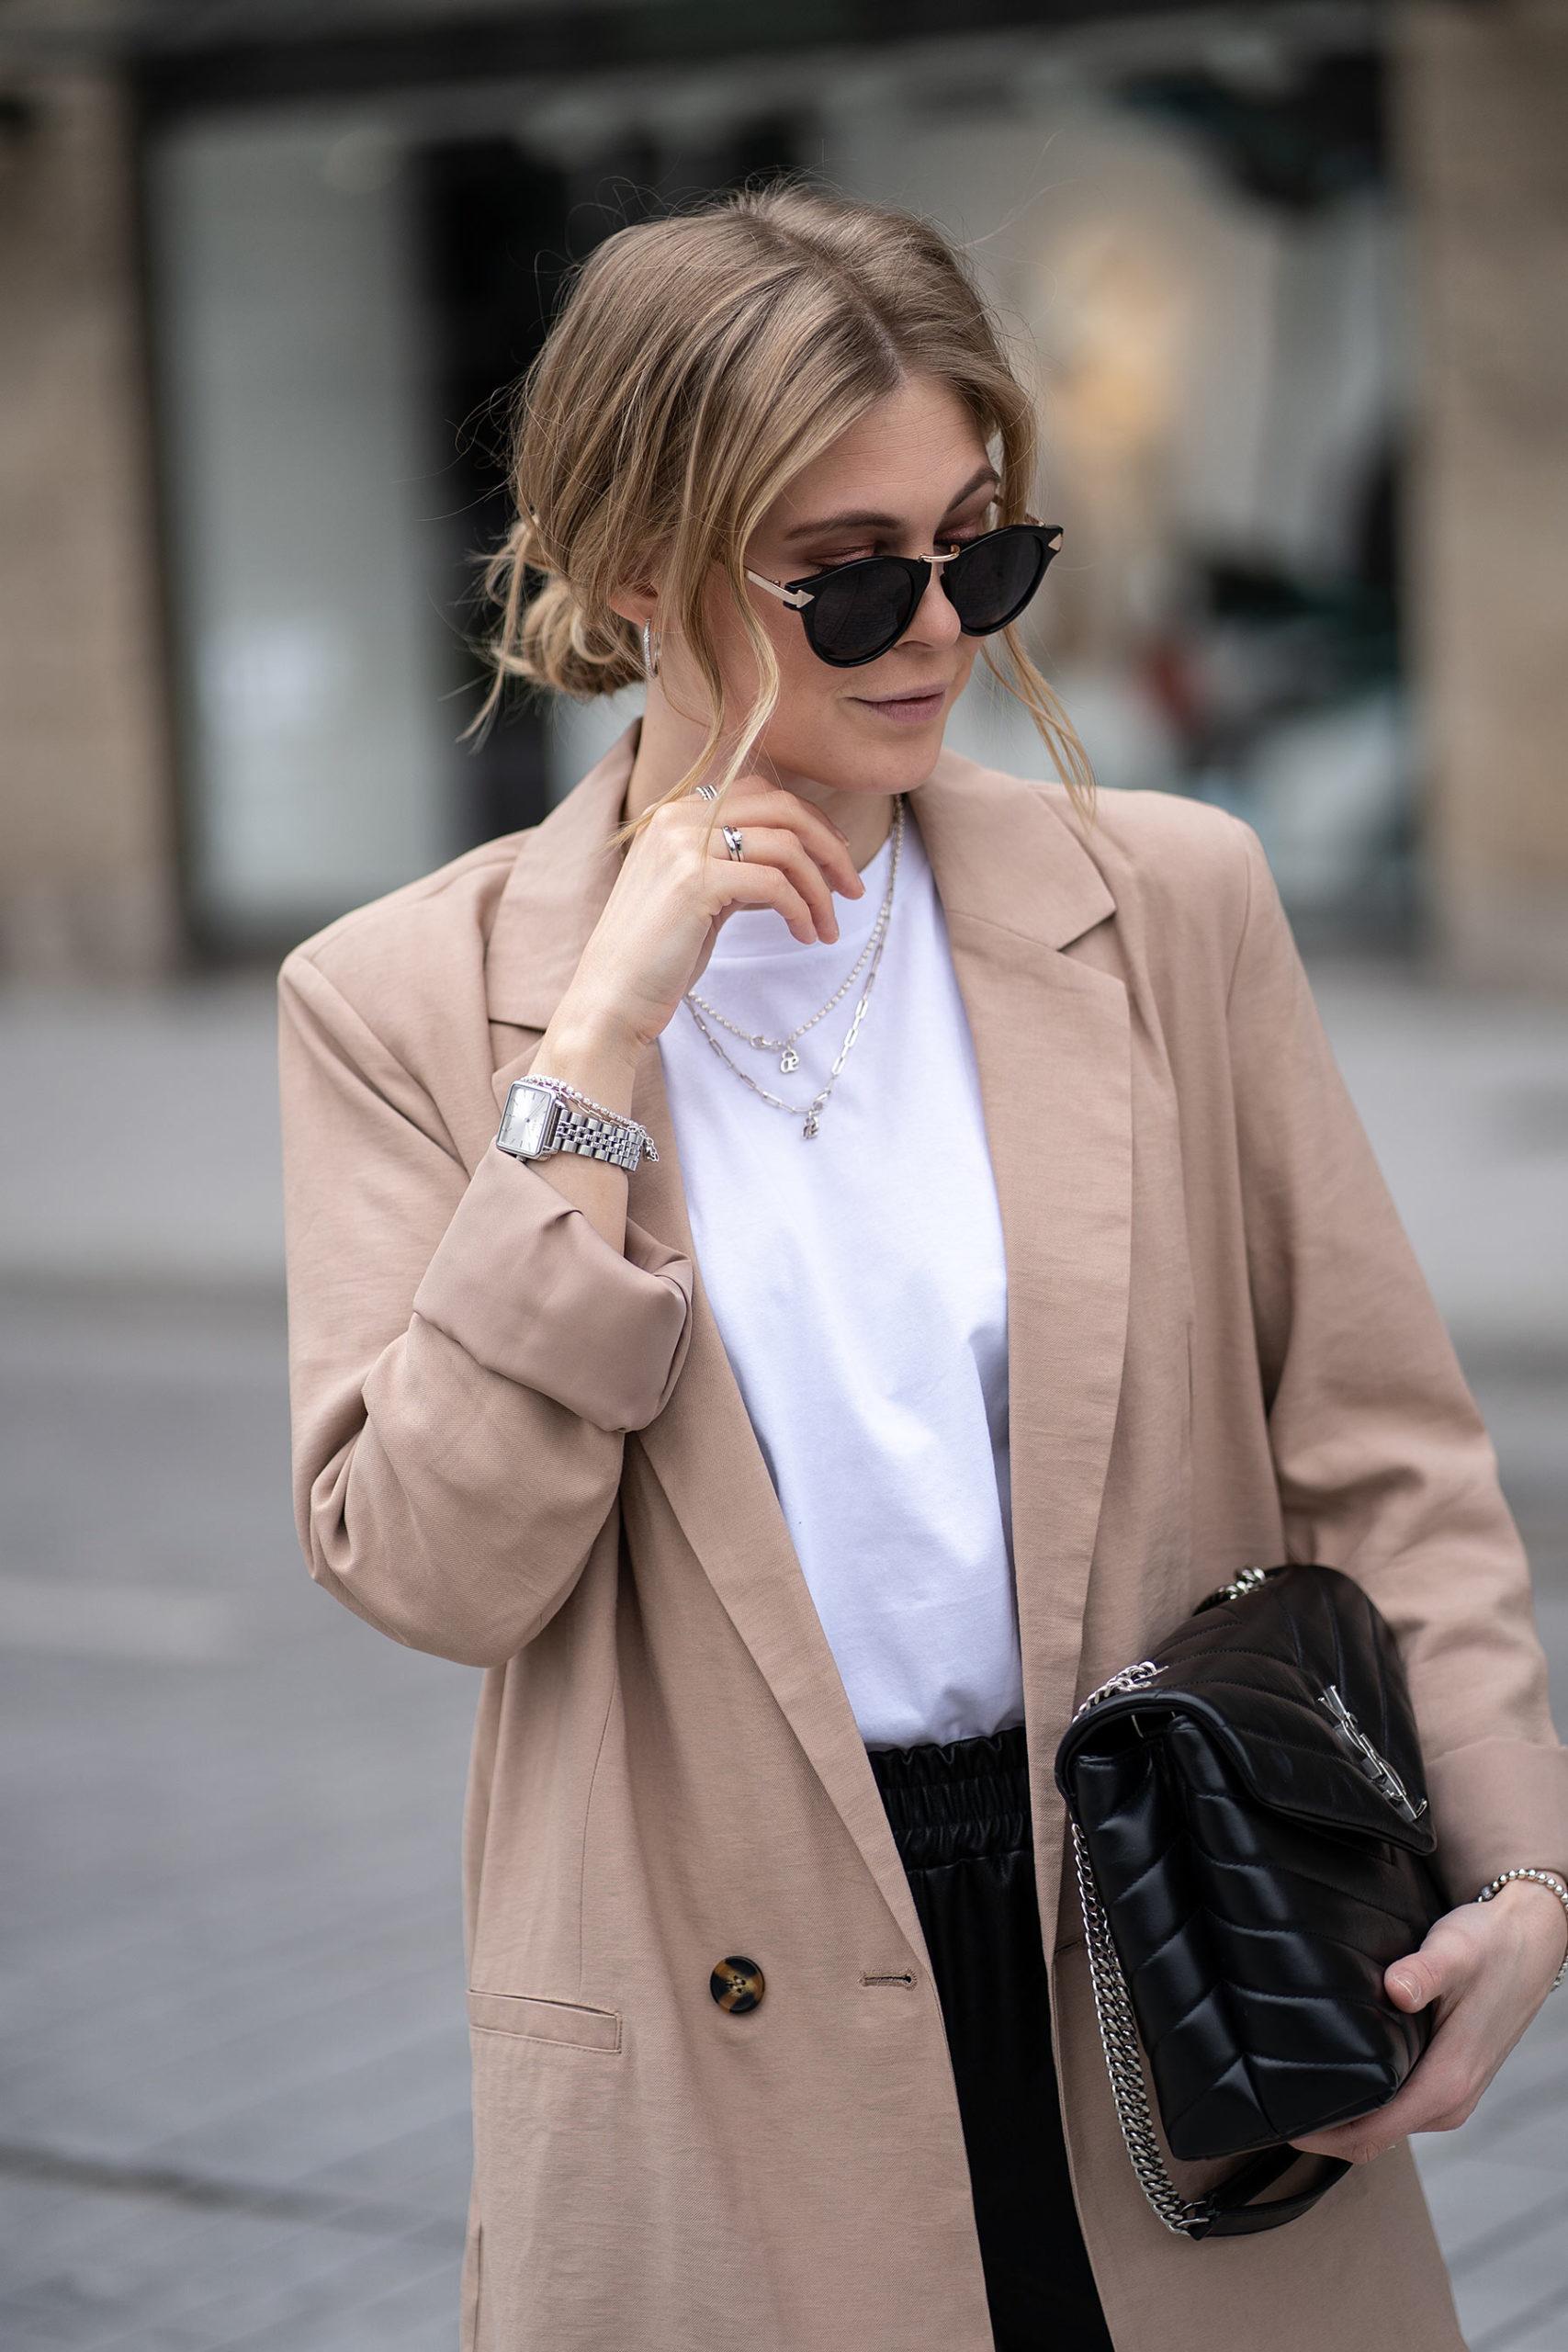 inga brauer blogger düsseldorf outfit frühling blazer beige